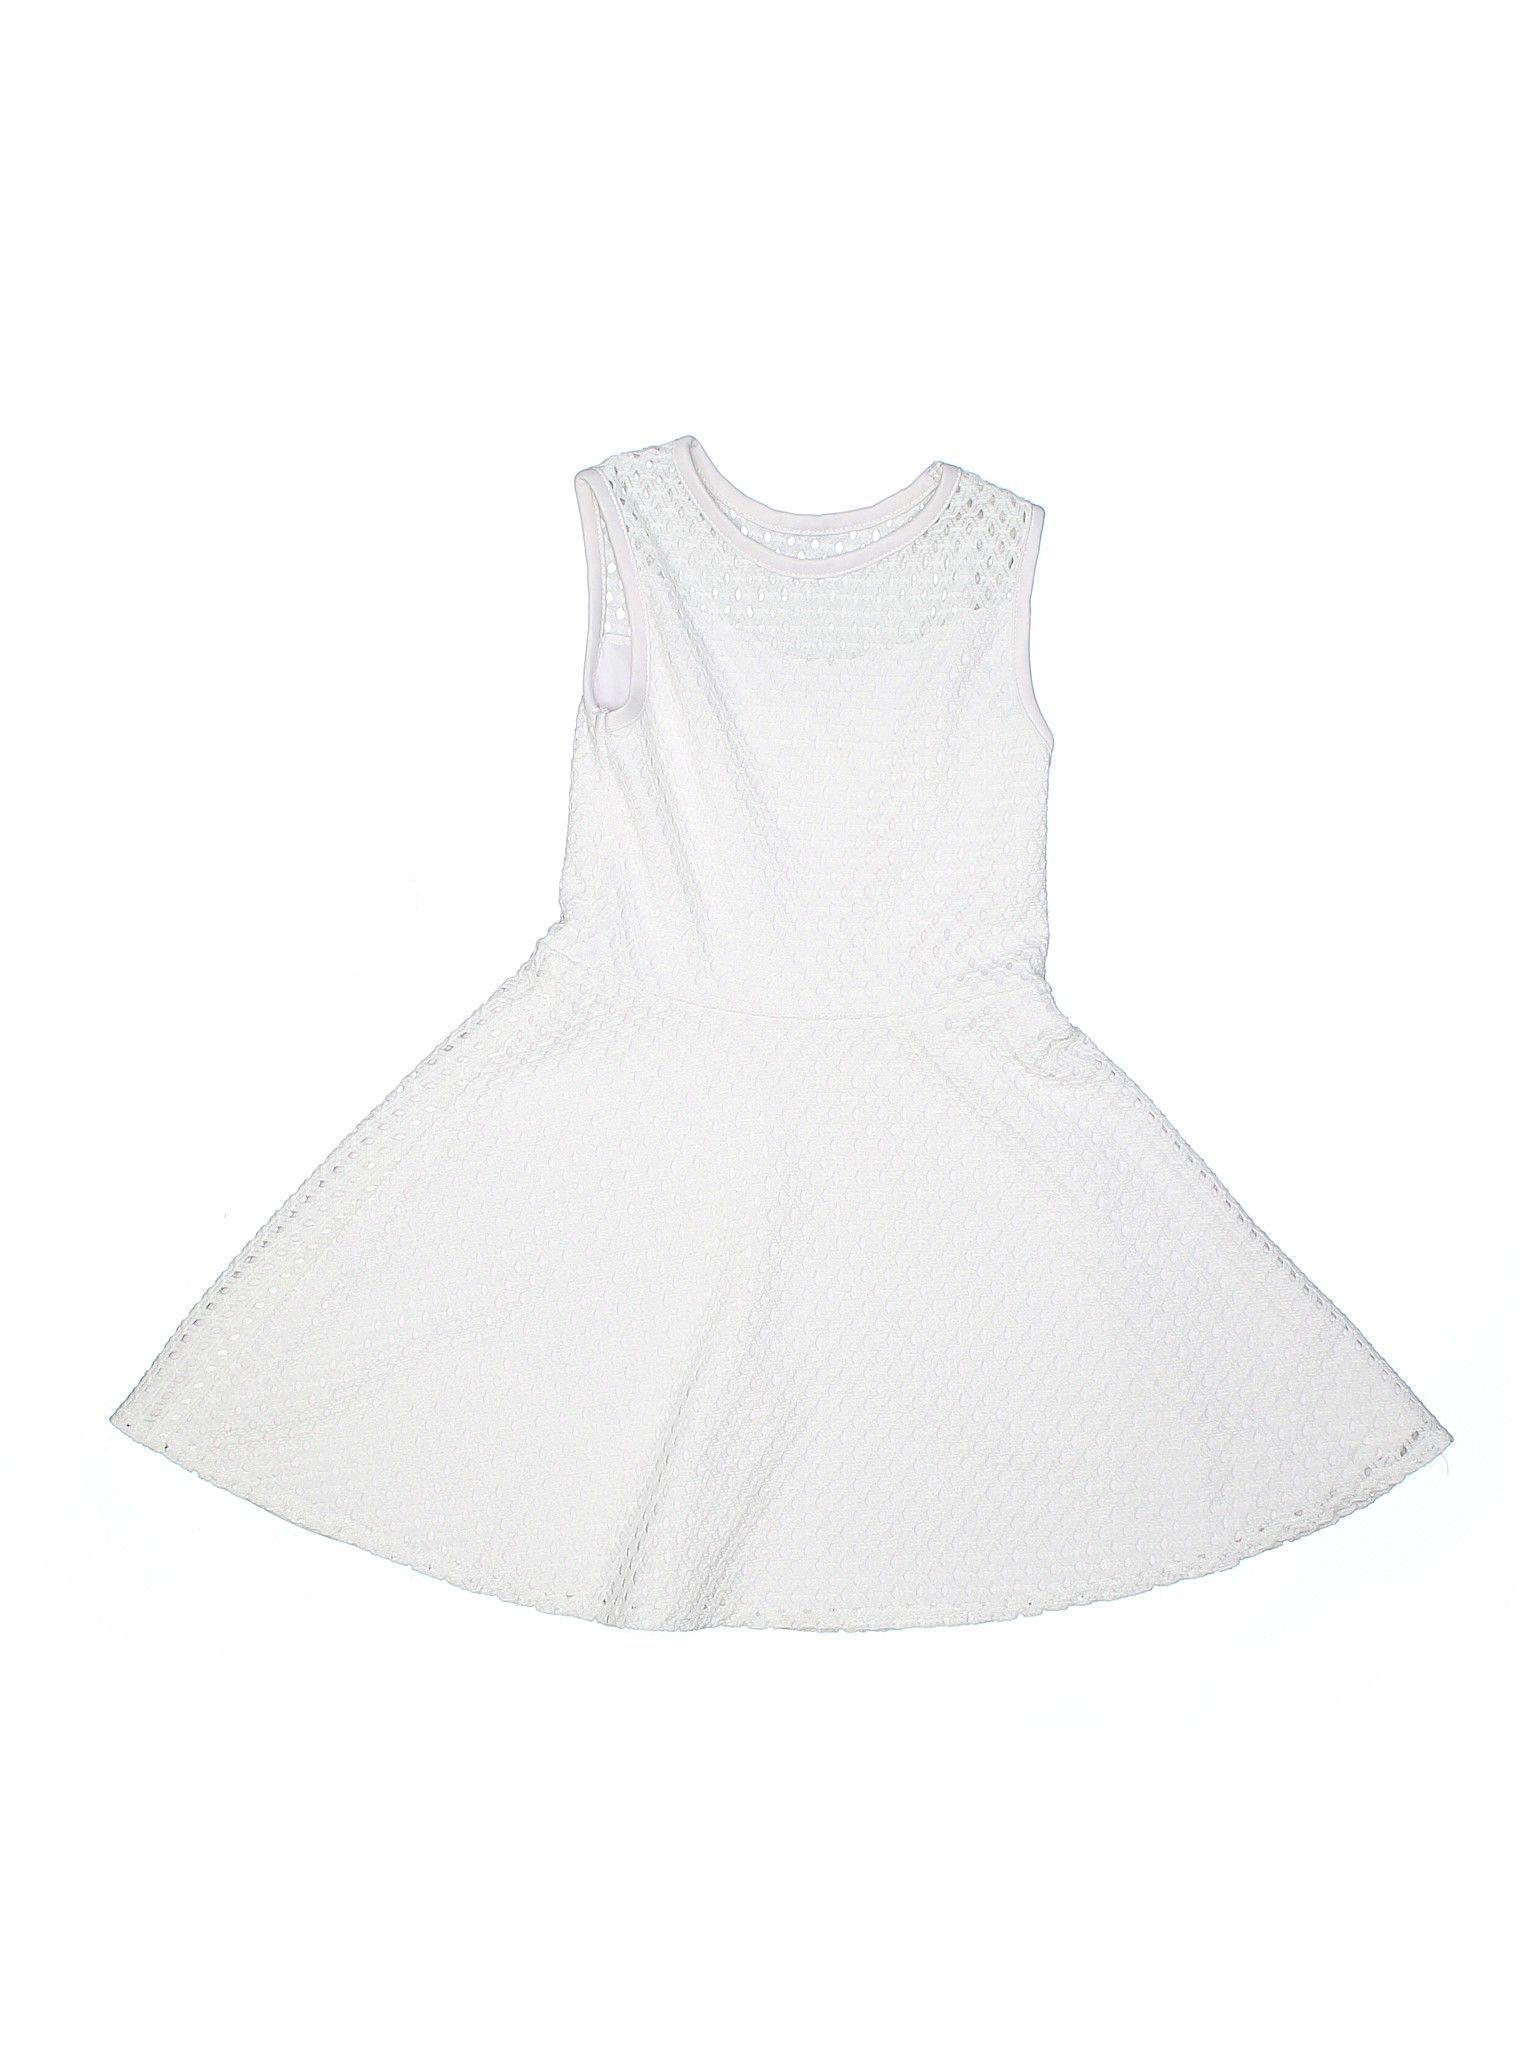 Sally Miller Dress: White Solid Skirts & Dresses - Used - Size 7 #sallymiller Sally Miller Dress: White Solid Skirts & Dresses - Used - Size 7 #sallymiller Sally Miller Dress: White Solid Skirts & Dresses - Used - Size 7 #sallymiller Sally Miller Dress: White Solid Skirts & Dresses - Used - Size 7 #sallymiller Sally Miller Dress: White Solid Skirts & Dresses - Used - Size 7 #sallymiller Sally Miller Dress: White Solid Skirts & Dresses - Used - Size 7 #sallymiller Sally Miller Dress: White Solid #sallymiller